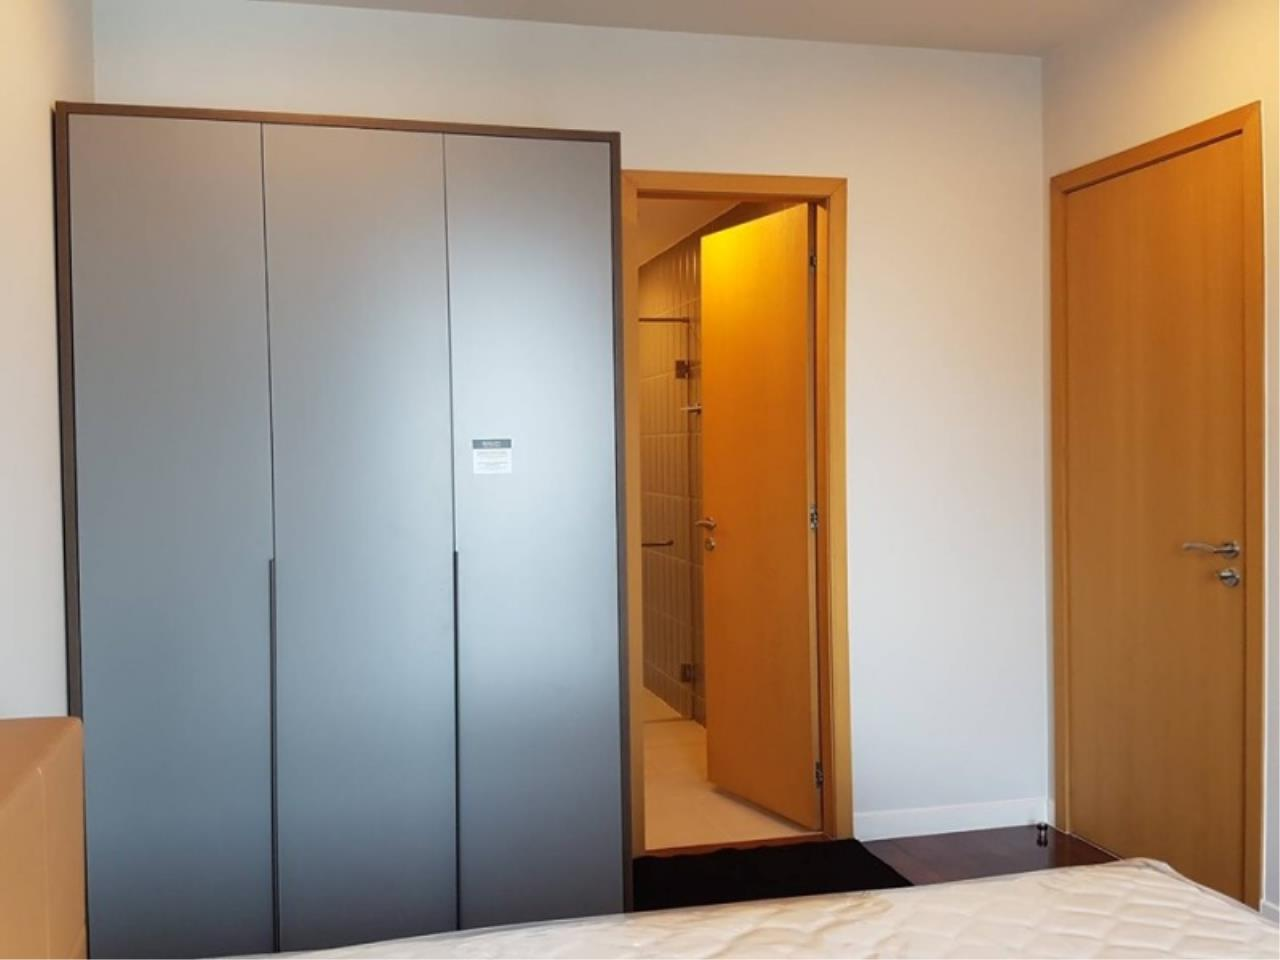 Century21 Skylux Agency's Circle Condominium / Condo For Rent / 1 Bedroom / 45 SQM / BTS Nana / Bangkok 4